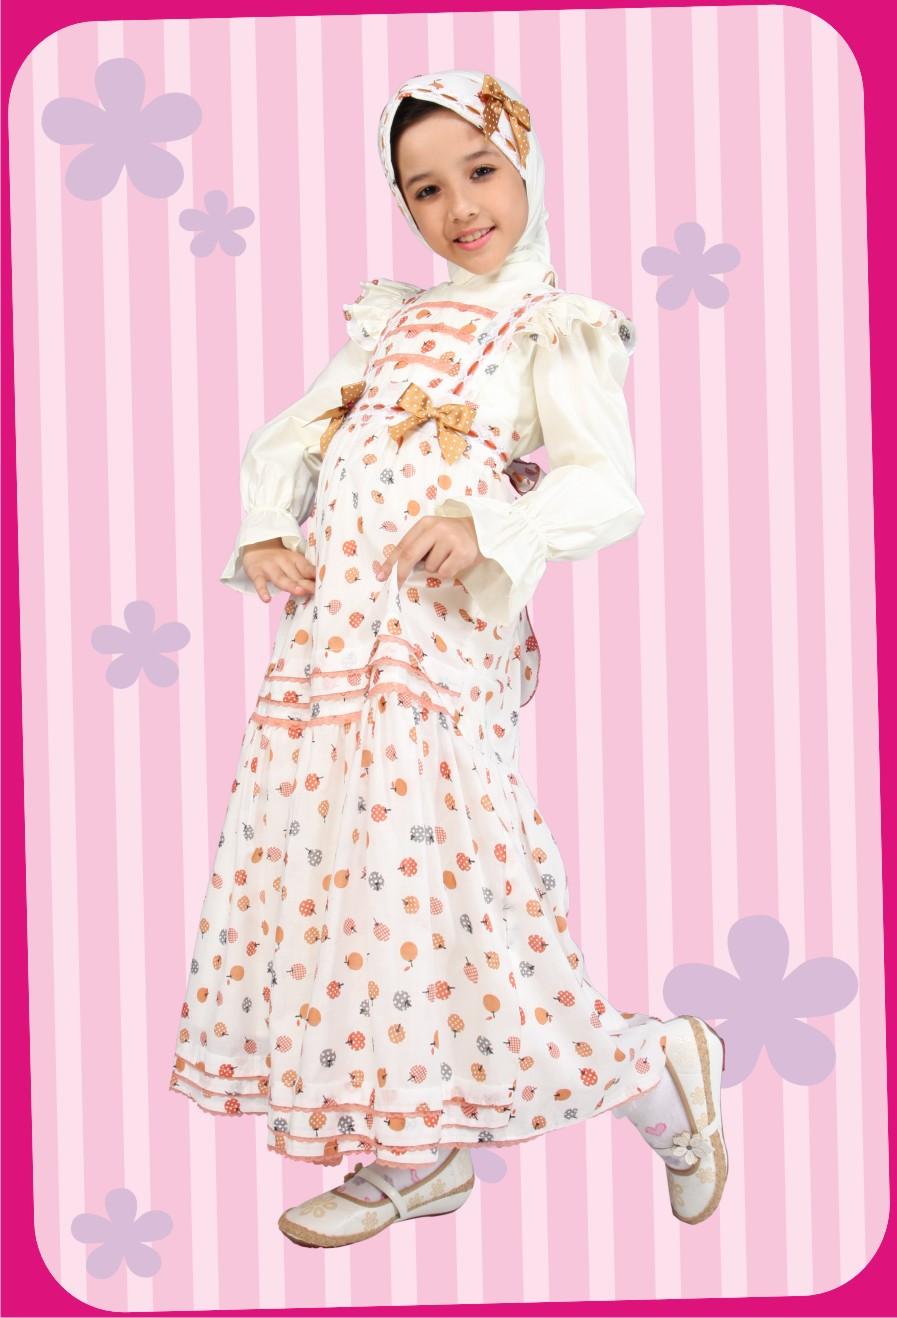 Baju Muslim Anak,  Baju Muslim Anak Murah, Baju Muslim Anak Perempuan, Baju Muslim Anak Dannis, Baju Muslim Anak Aini, Baju Muslim Anak-anak, Baju Muslim Anak Keke, Baju Muslim Anak Poeti, Baju Muslim Anak Grosir, Baju Muslim Anak Laki-laki